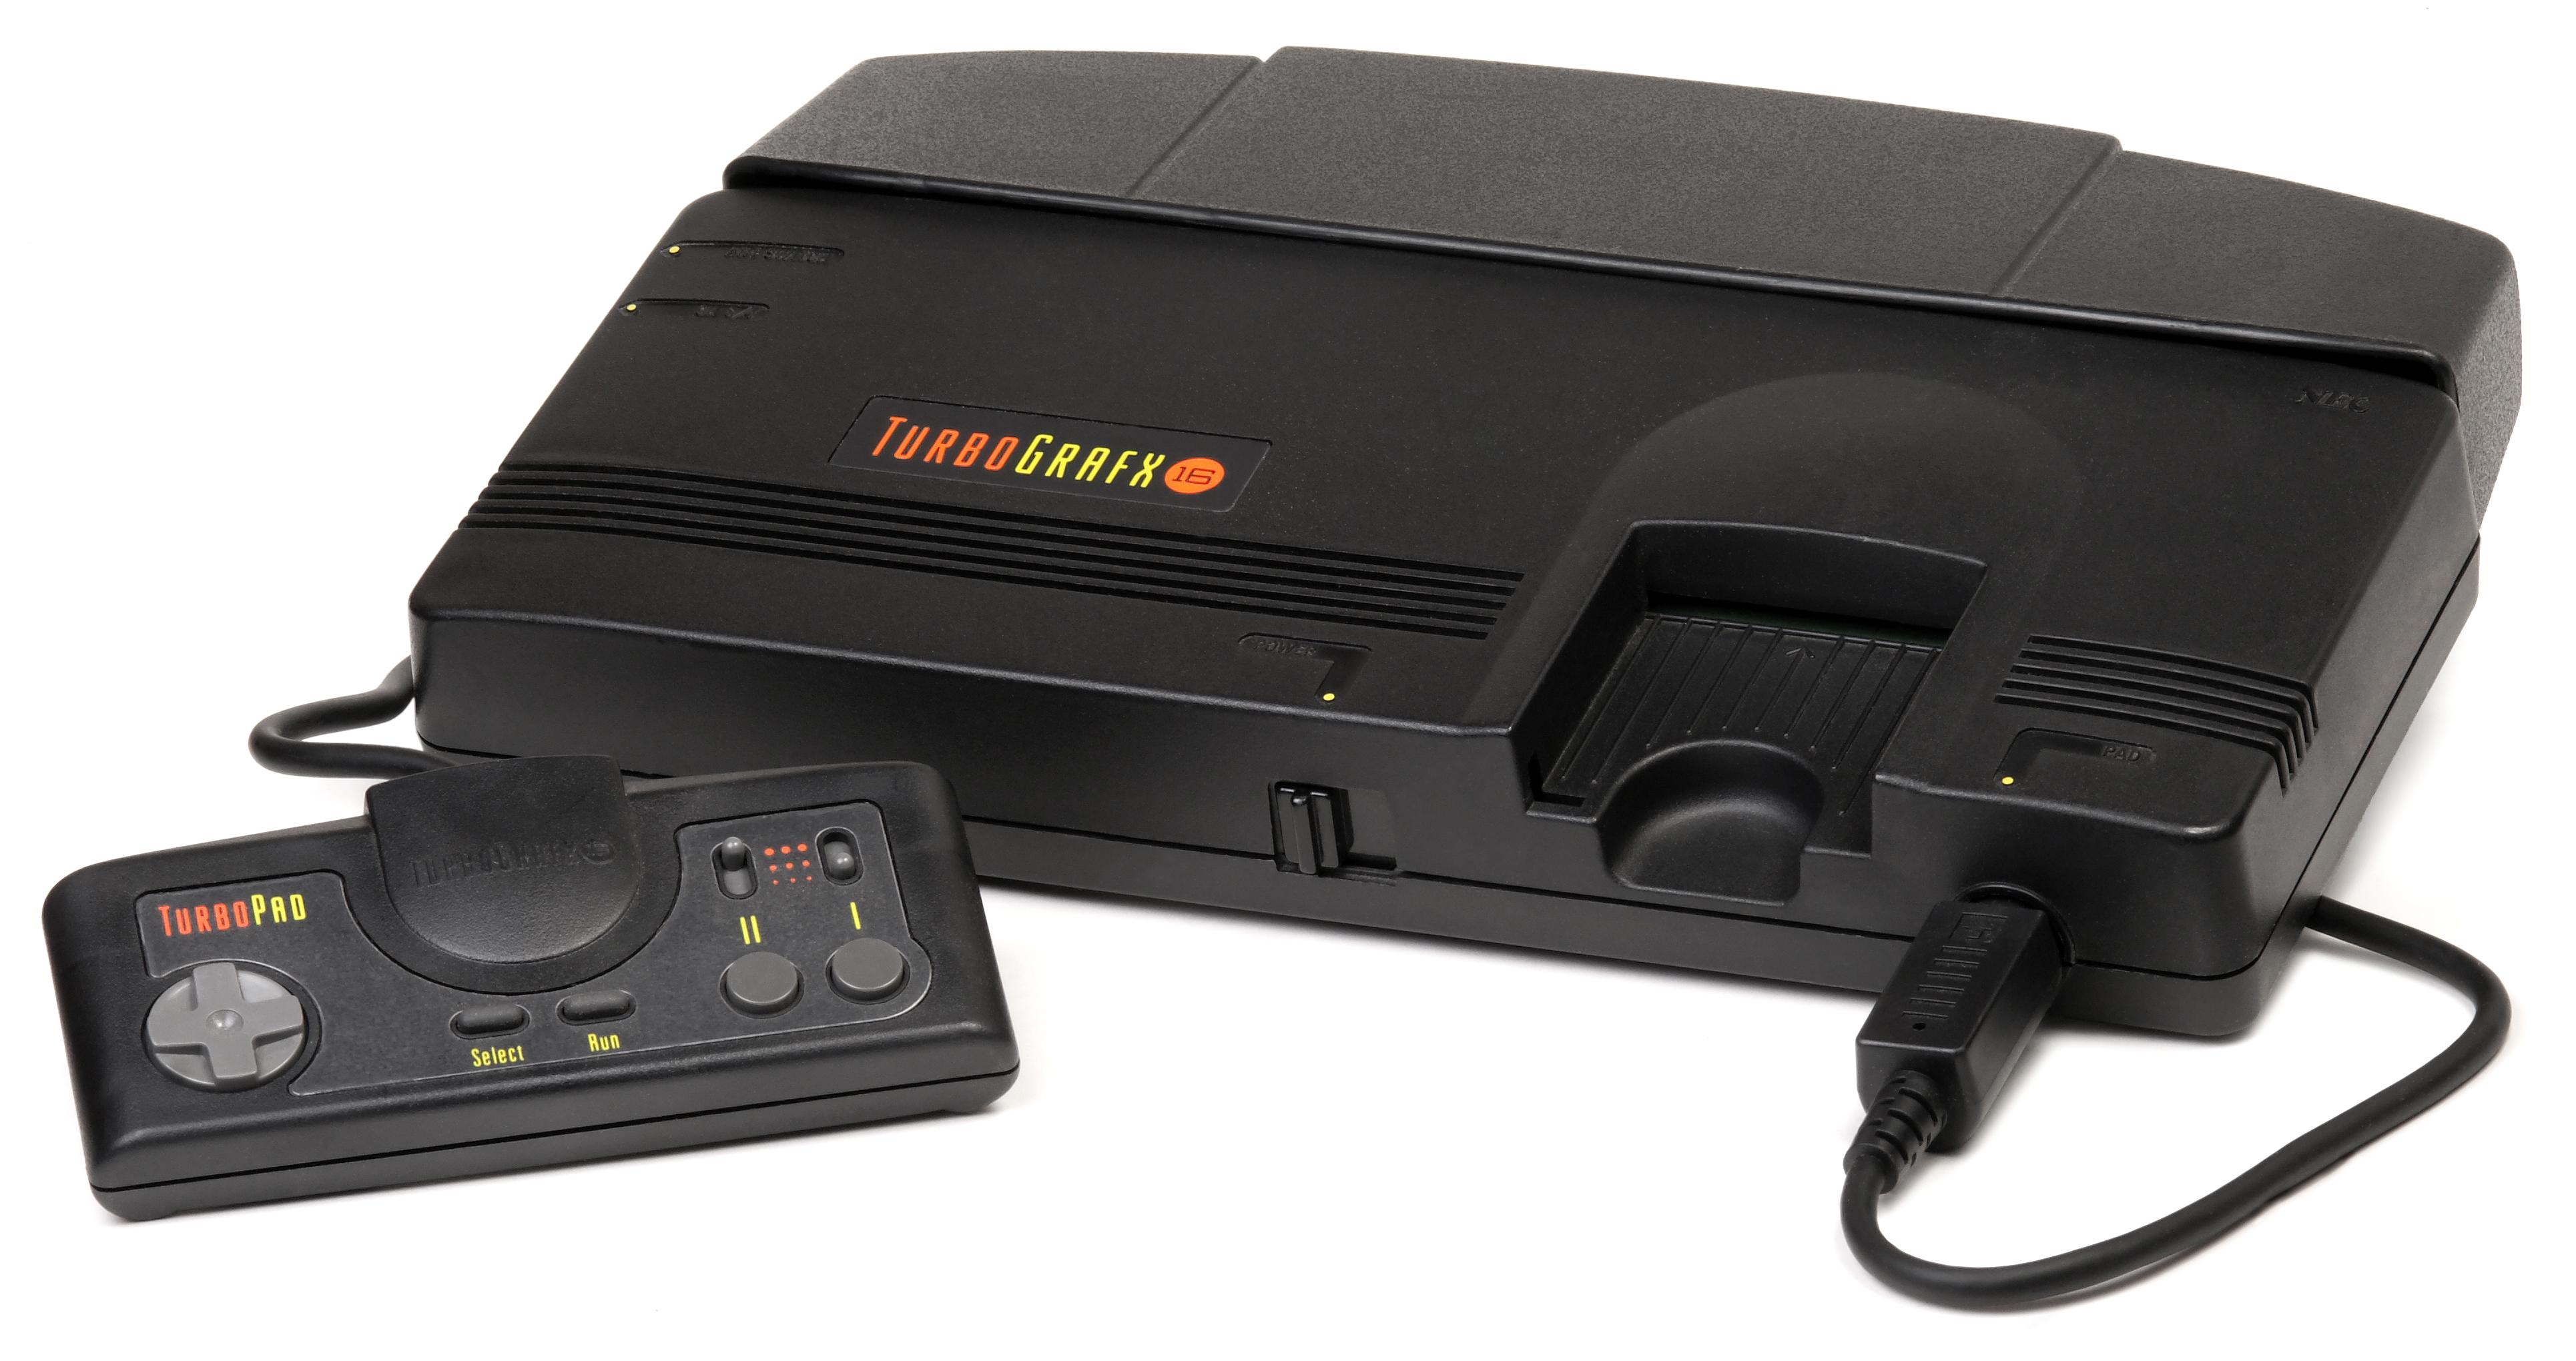 Nyko PlayPad PC Engine TurboGrafx 16 TG16 Emulator